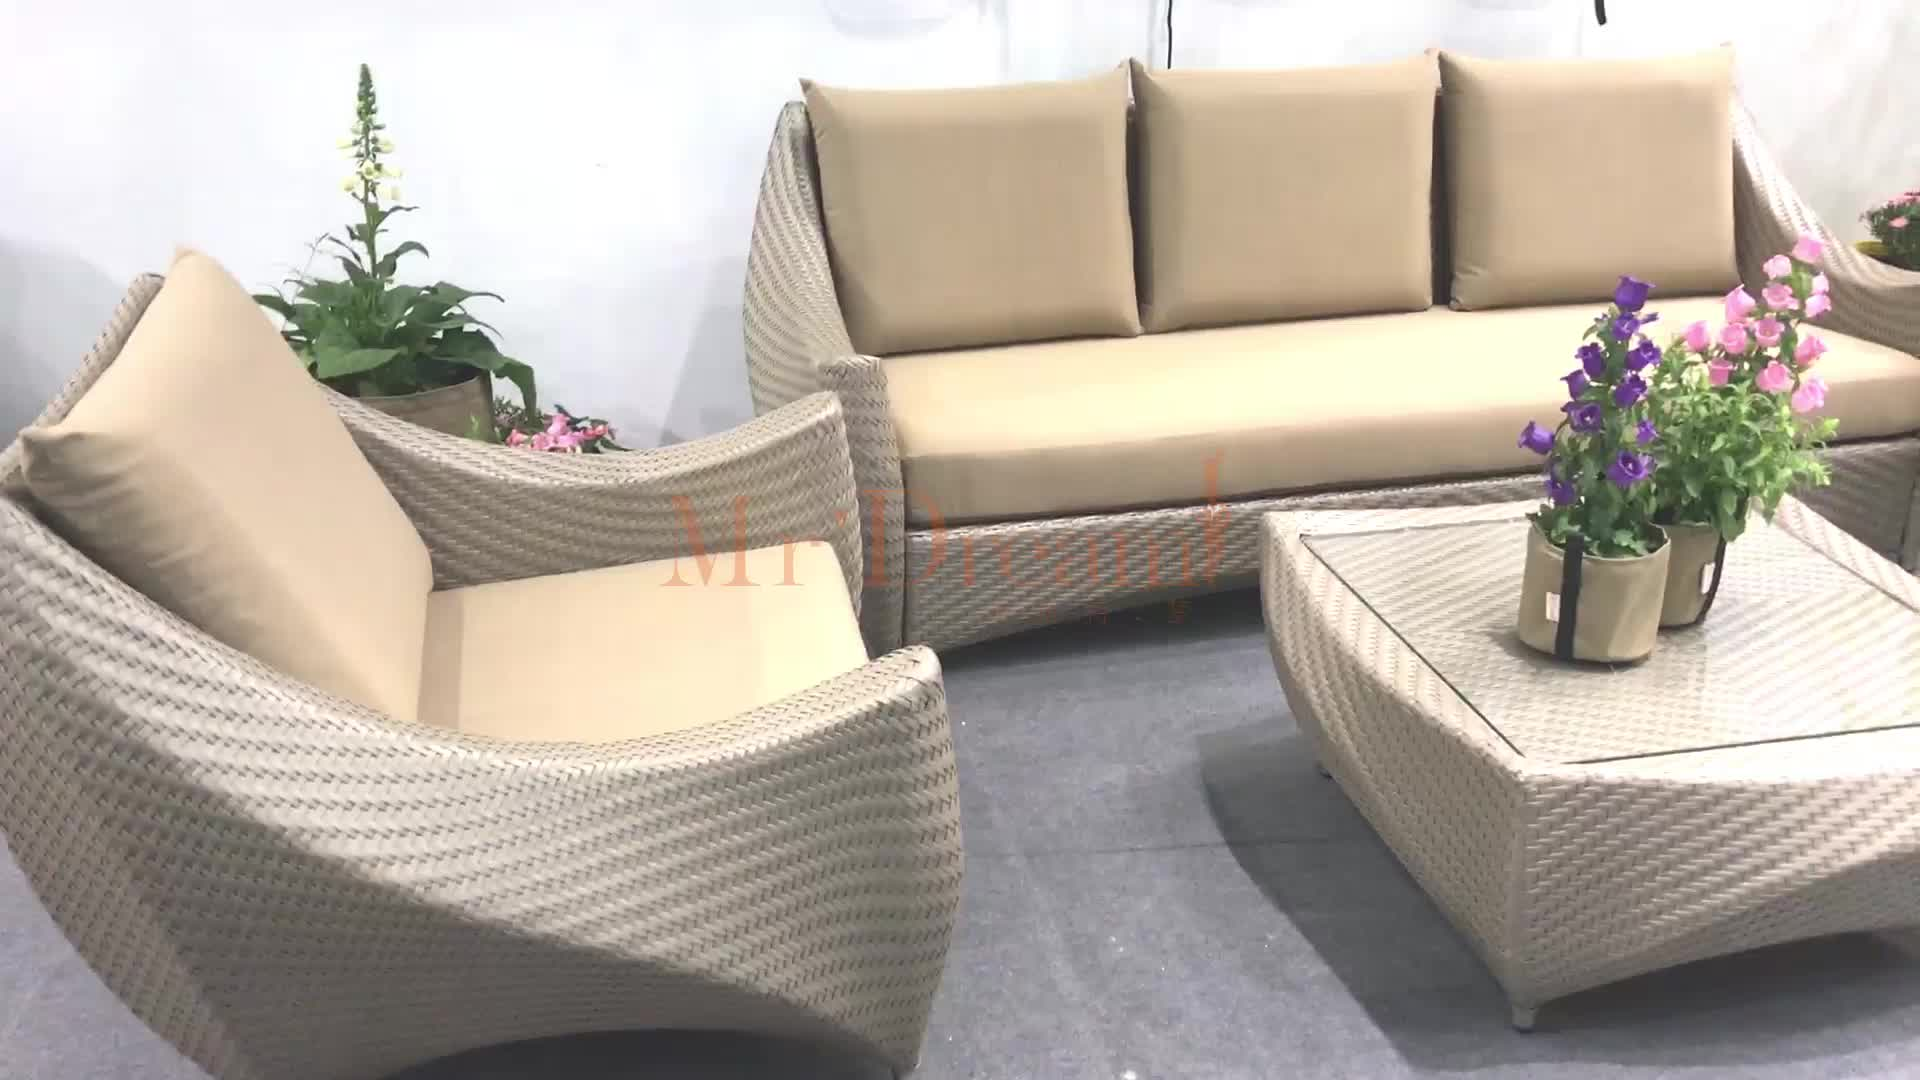 Foshan supplier high end used modern Hilton hotel cast aluminum poly rattan furniture